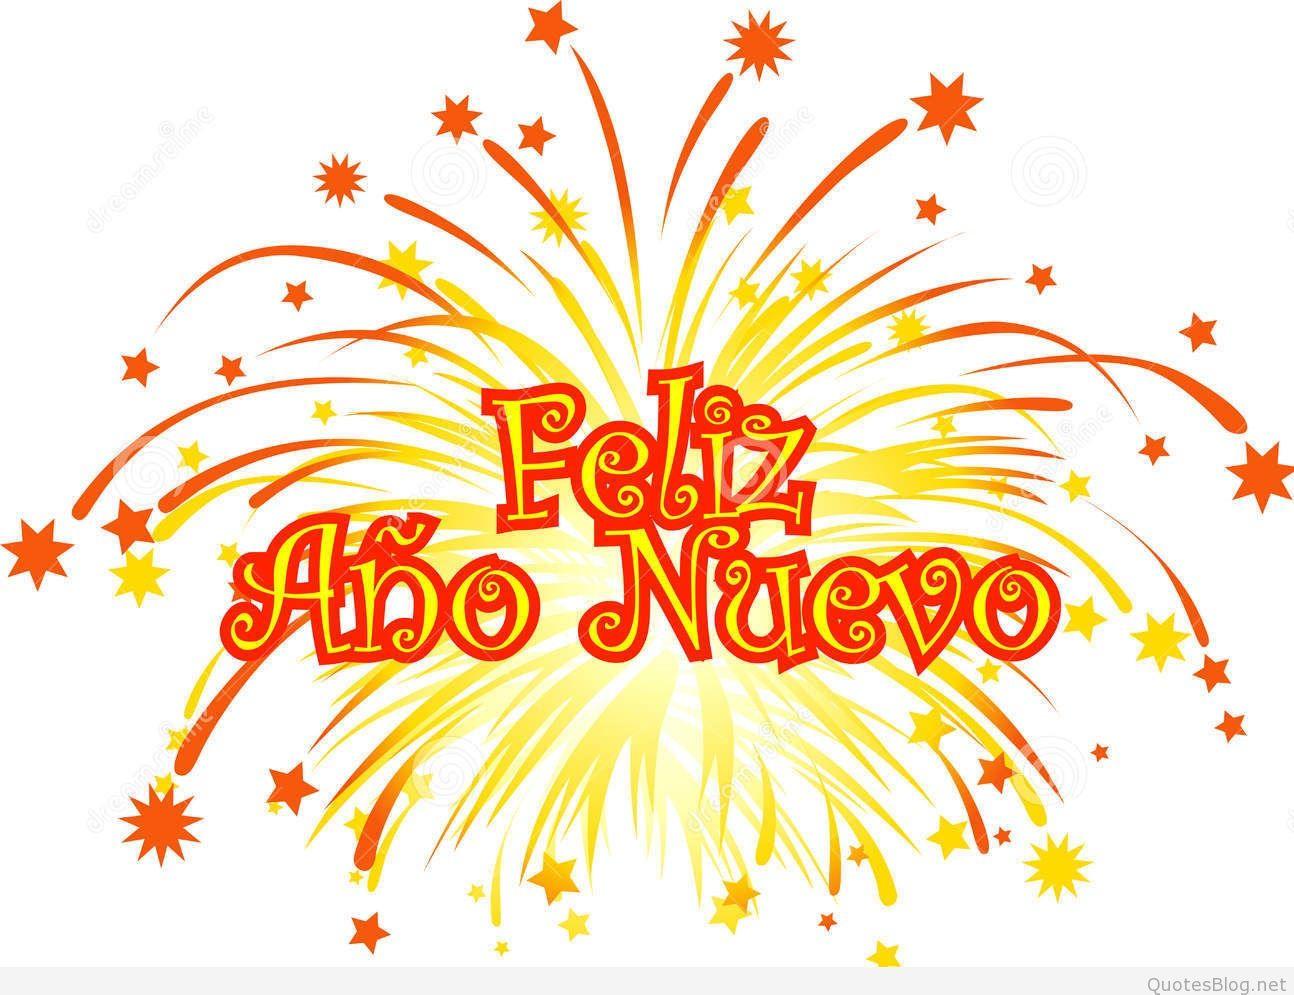 Feliz a o 2018 clipart jpg transparent download Happy New Year in Spanish Images. Feliz Año Nuevo Imagenes. jpg transparent download